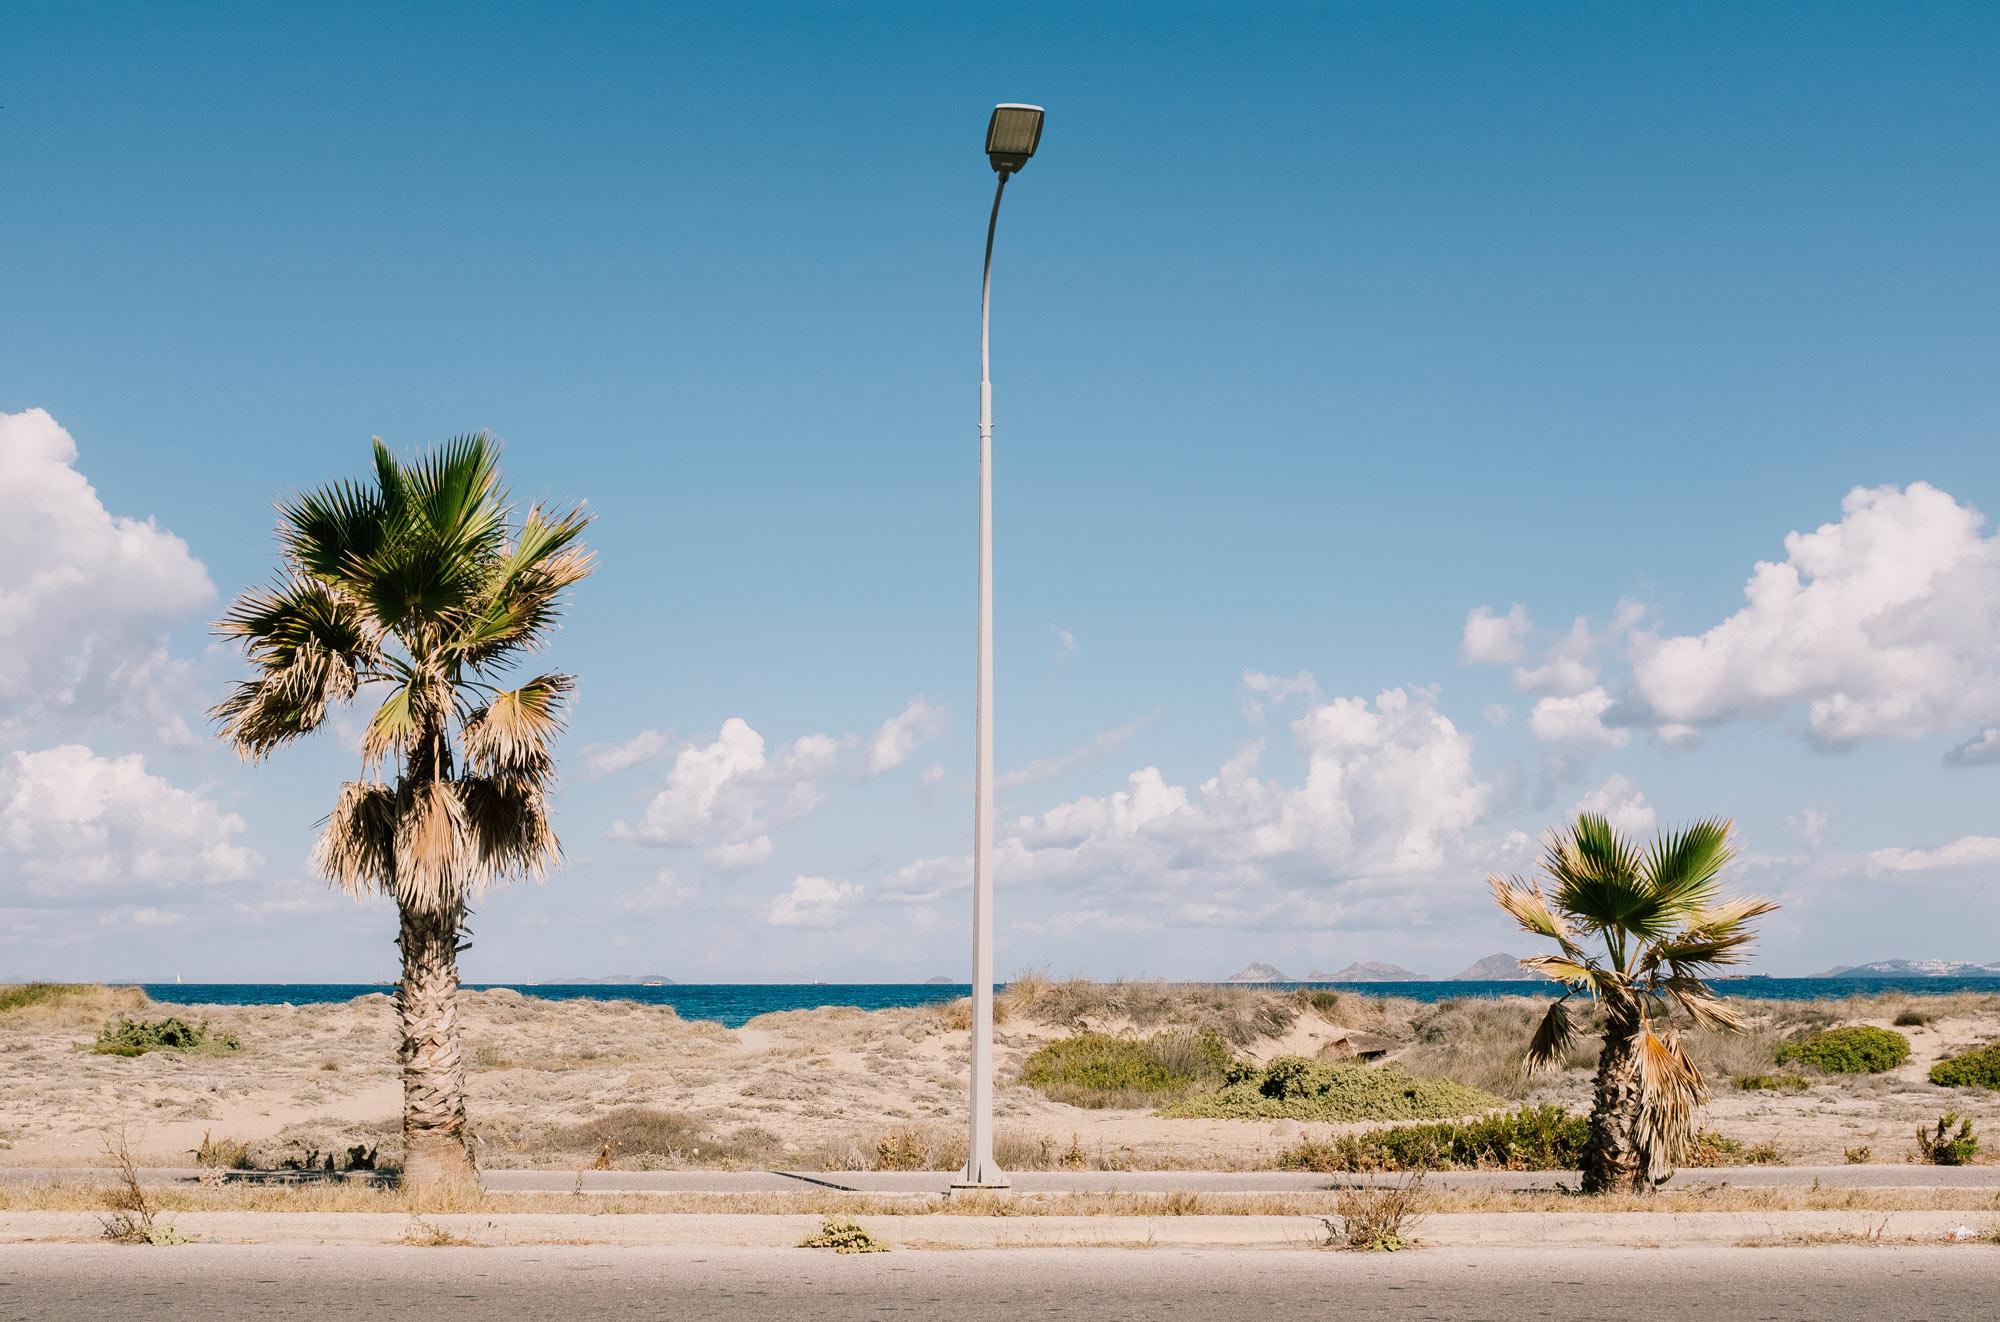 Reisefotografie, Reportage, Dokumentation, christian kudler, fotograf